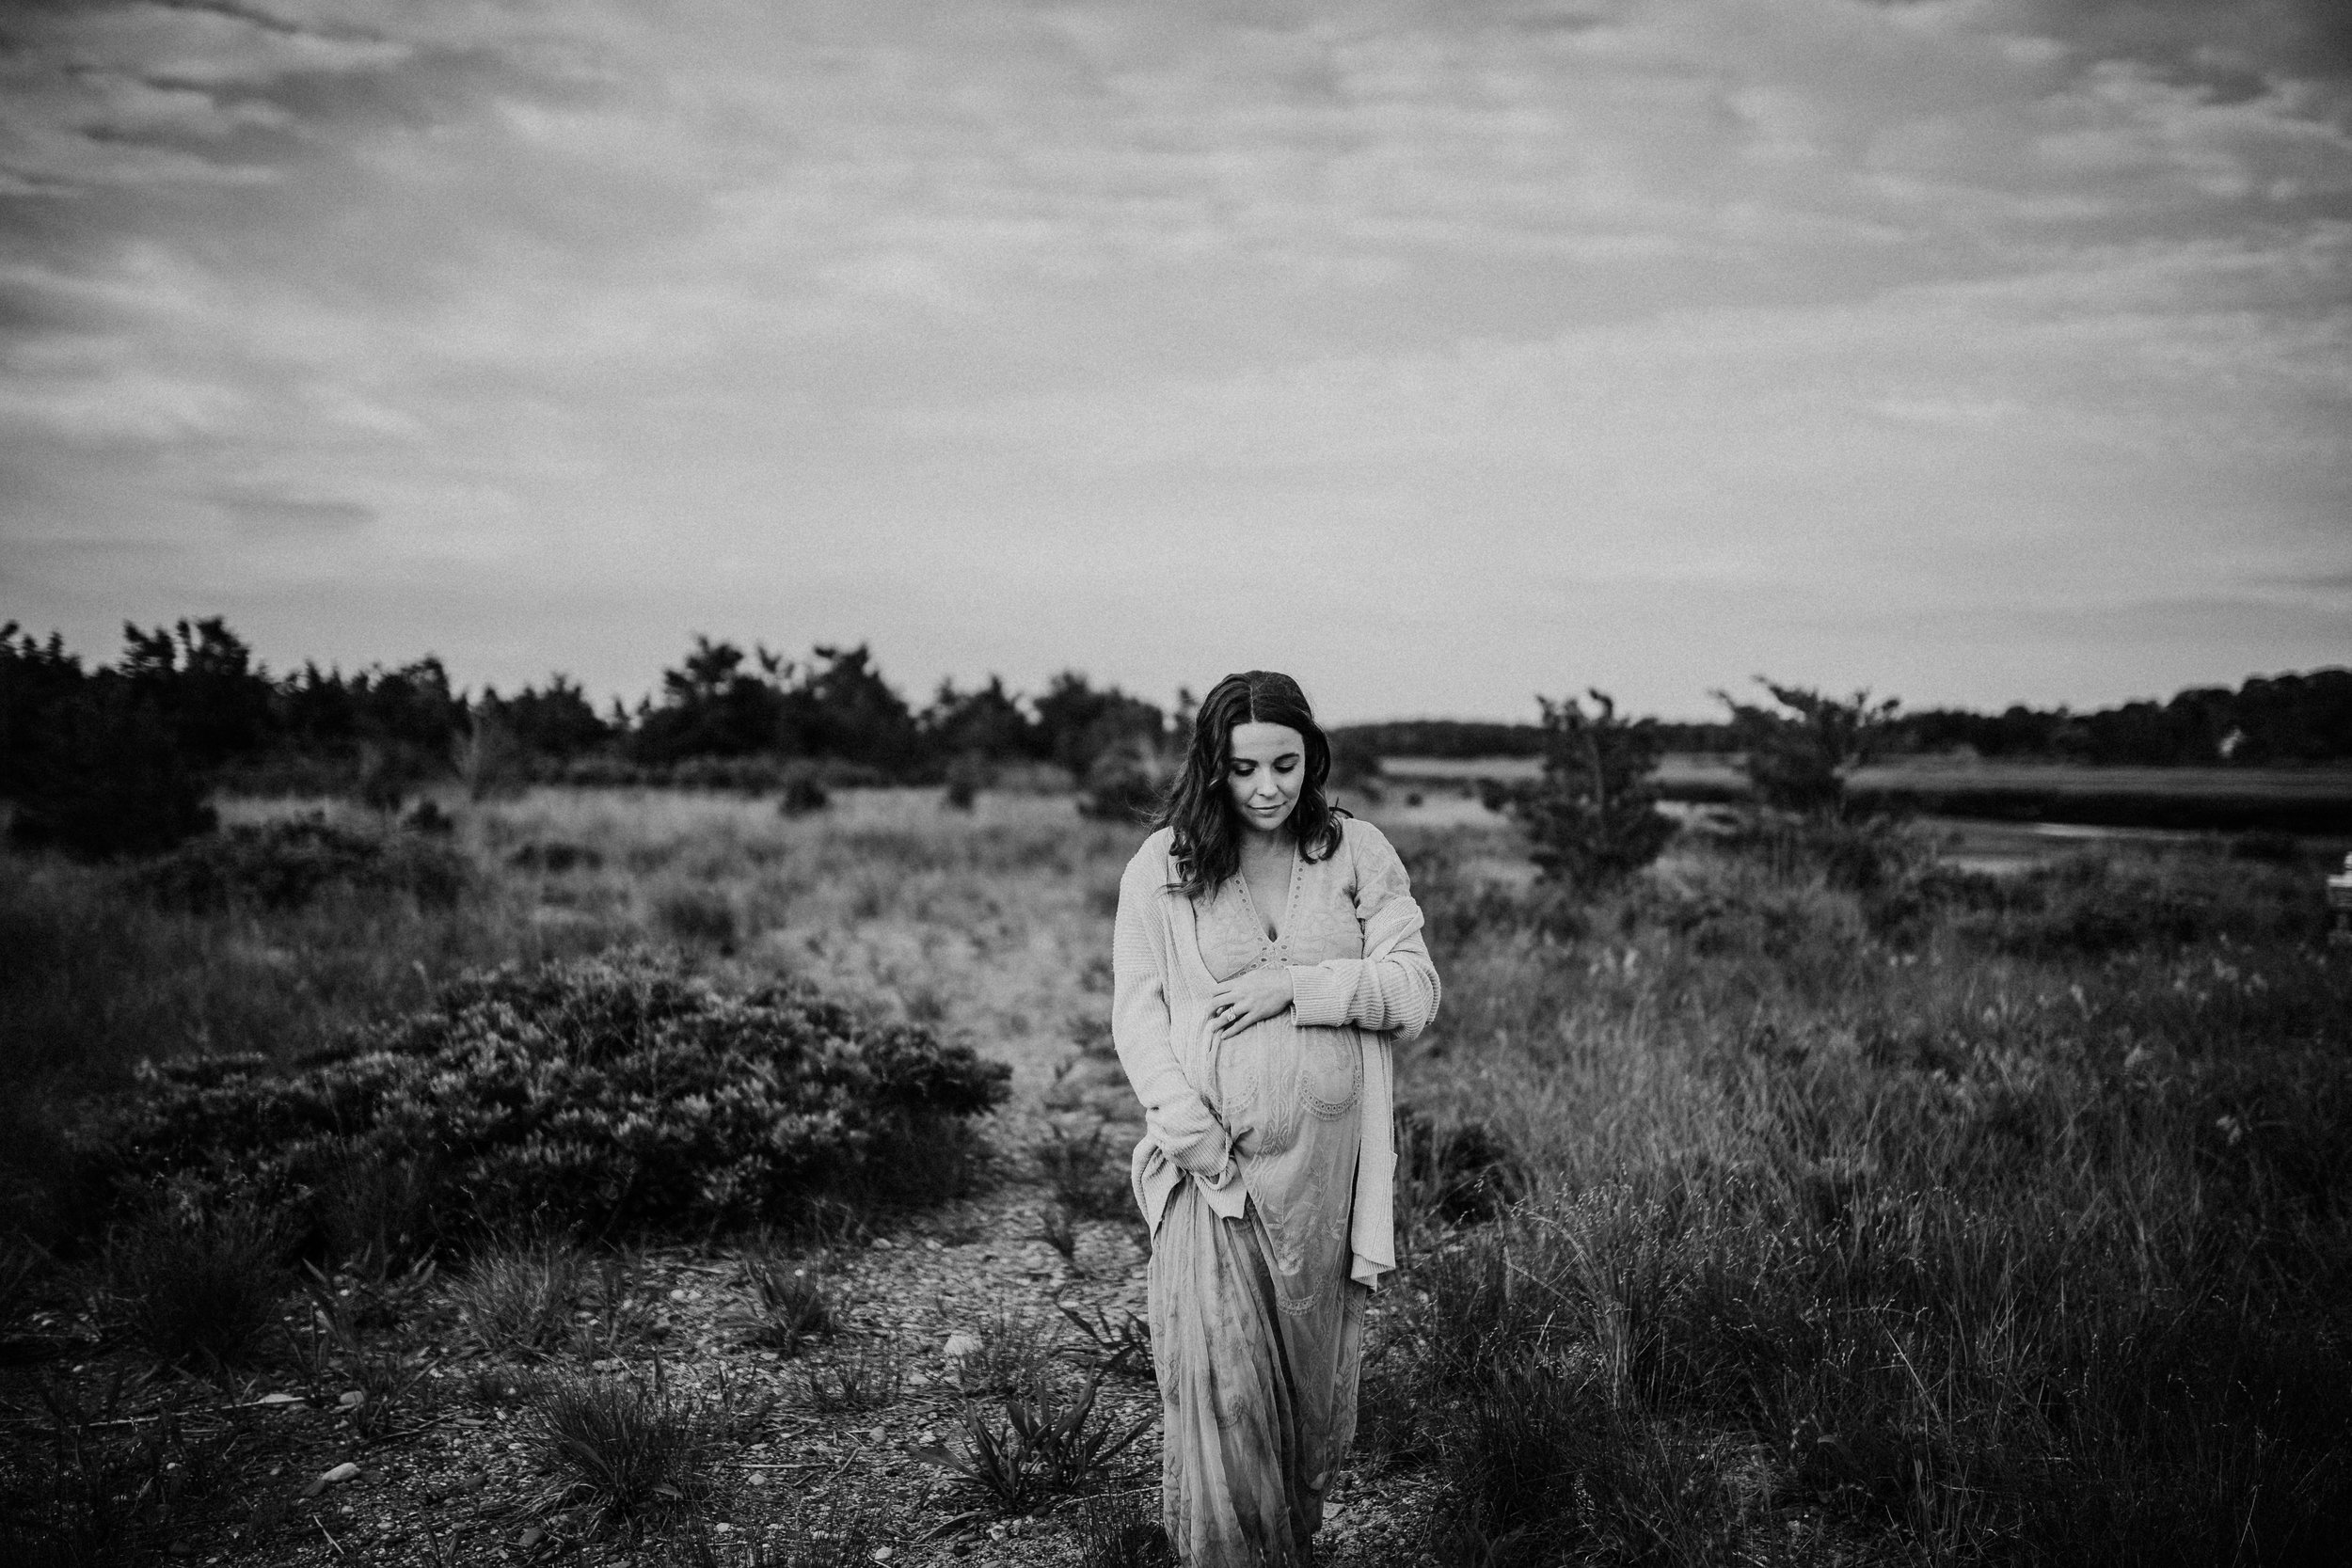 Sunrise Maternity Session at Rexhame Beach | Marshfield, MA Maternity Lifestyle Portrait Photographer